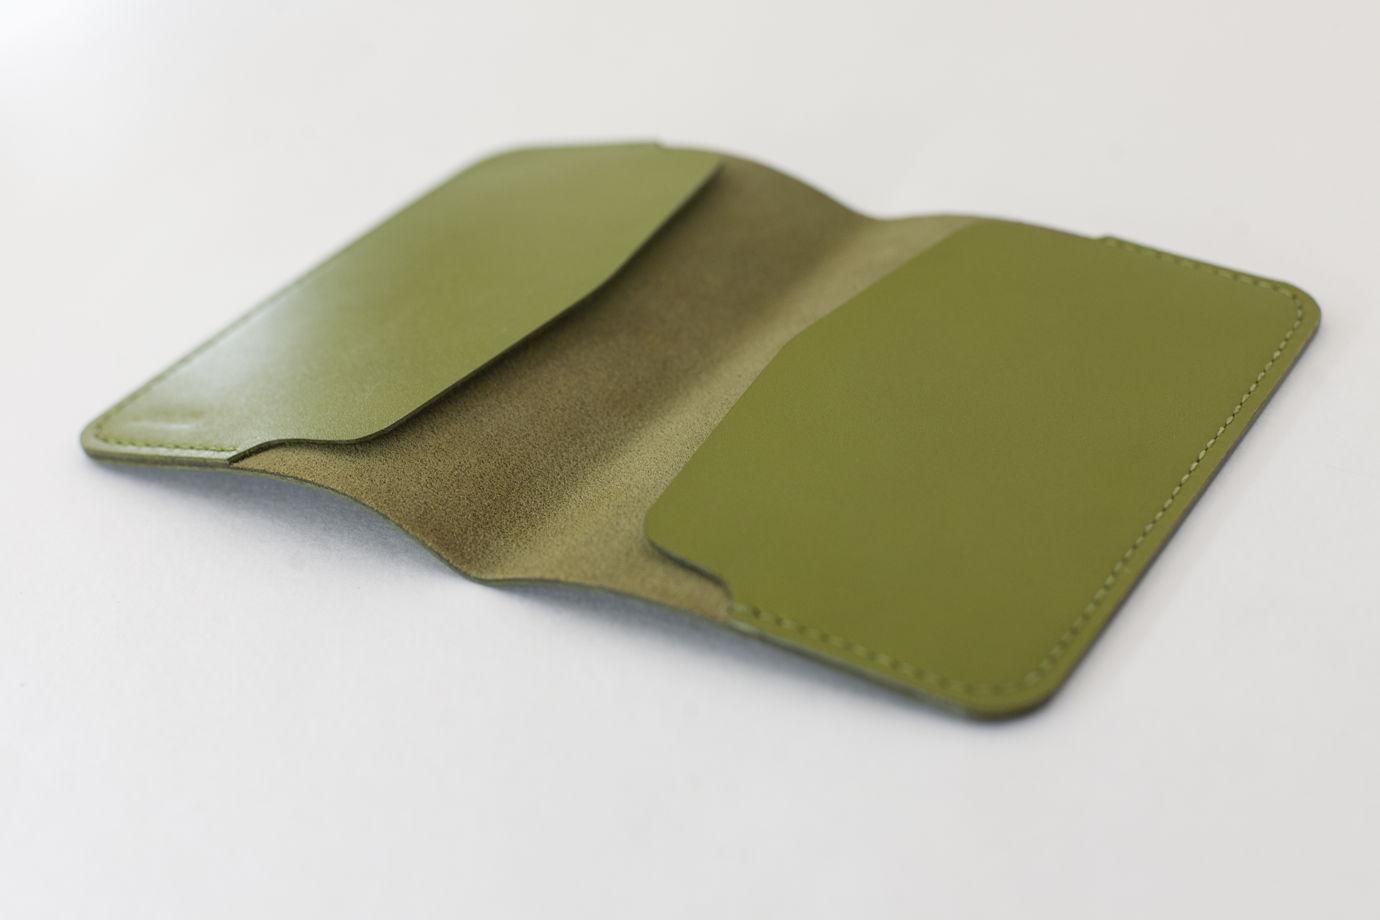 Обложка на паспорт Passport cover зеленая